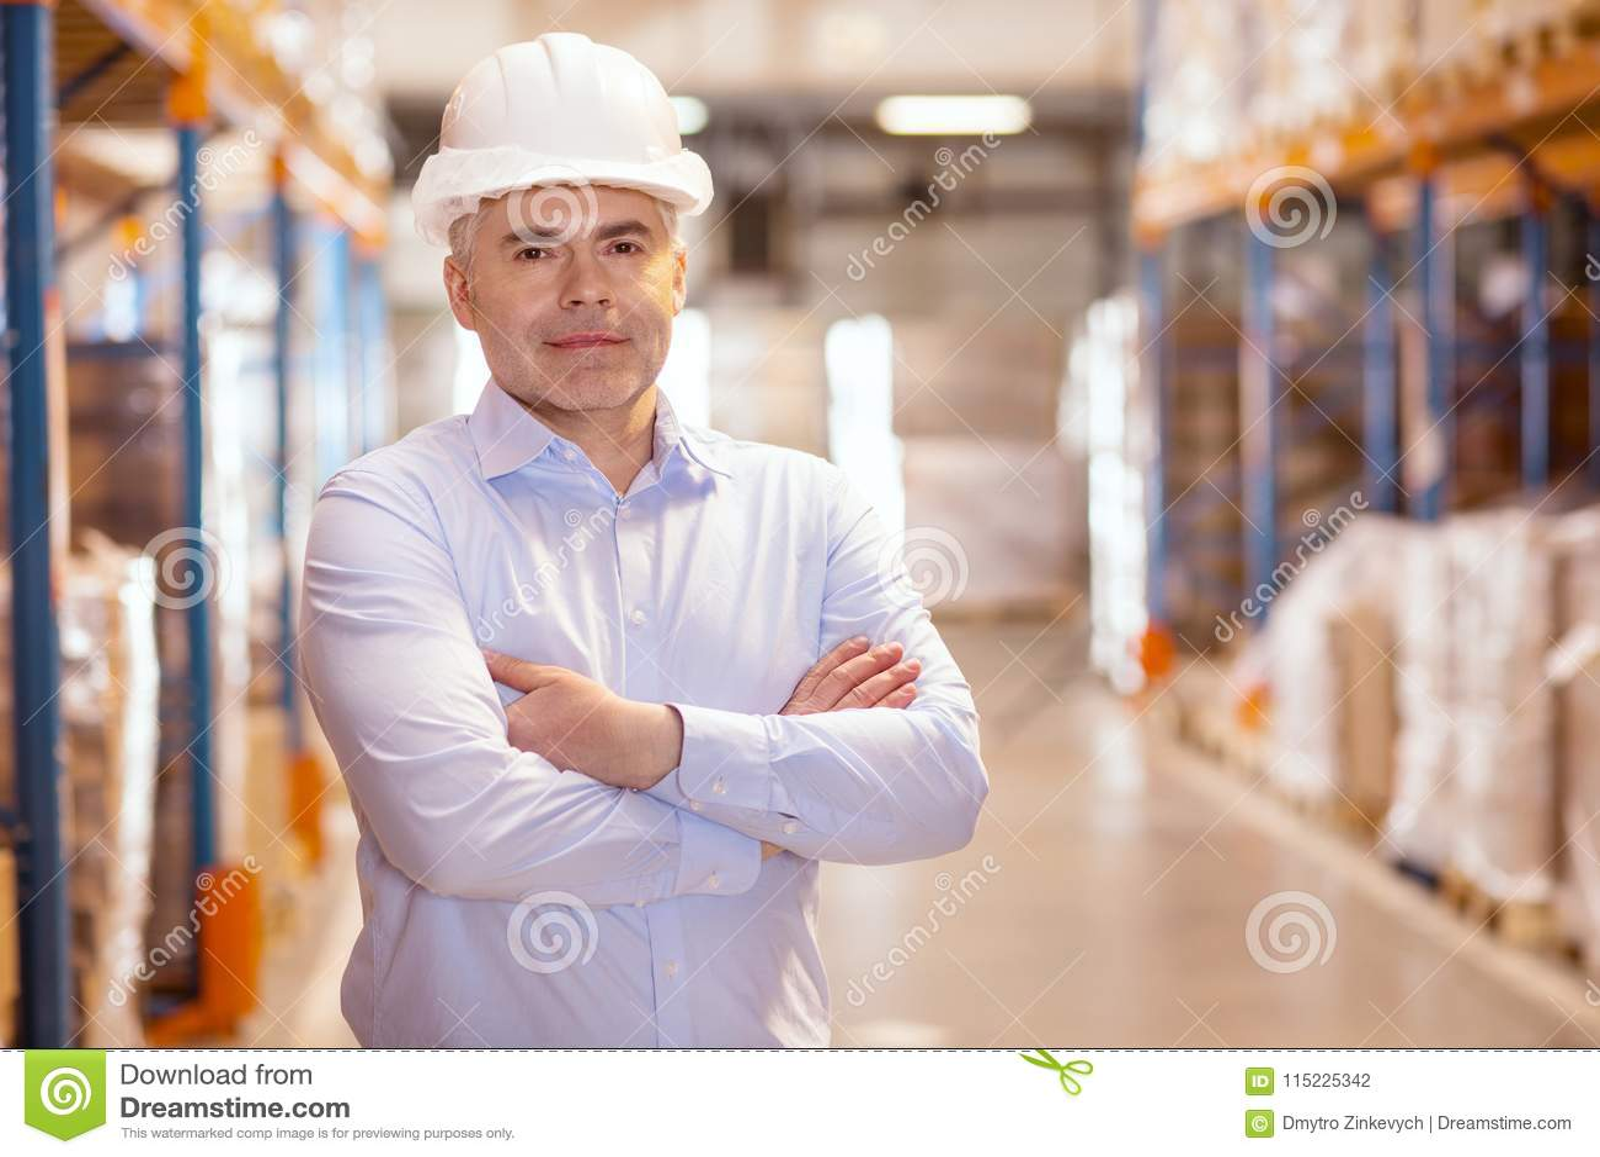 Cheerful Logistics Manager Enjoying His Job Stock Photo - Image of